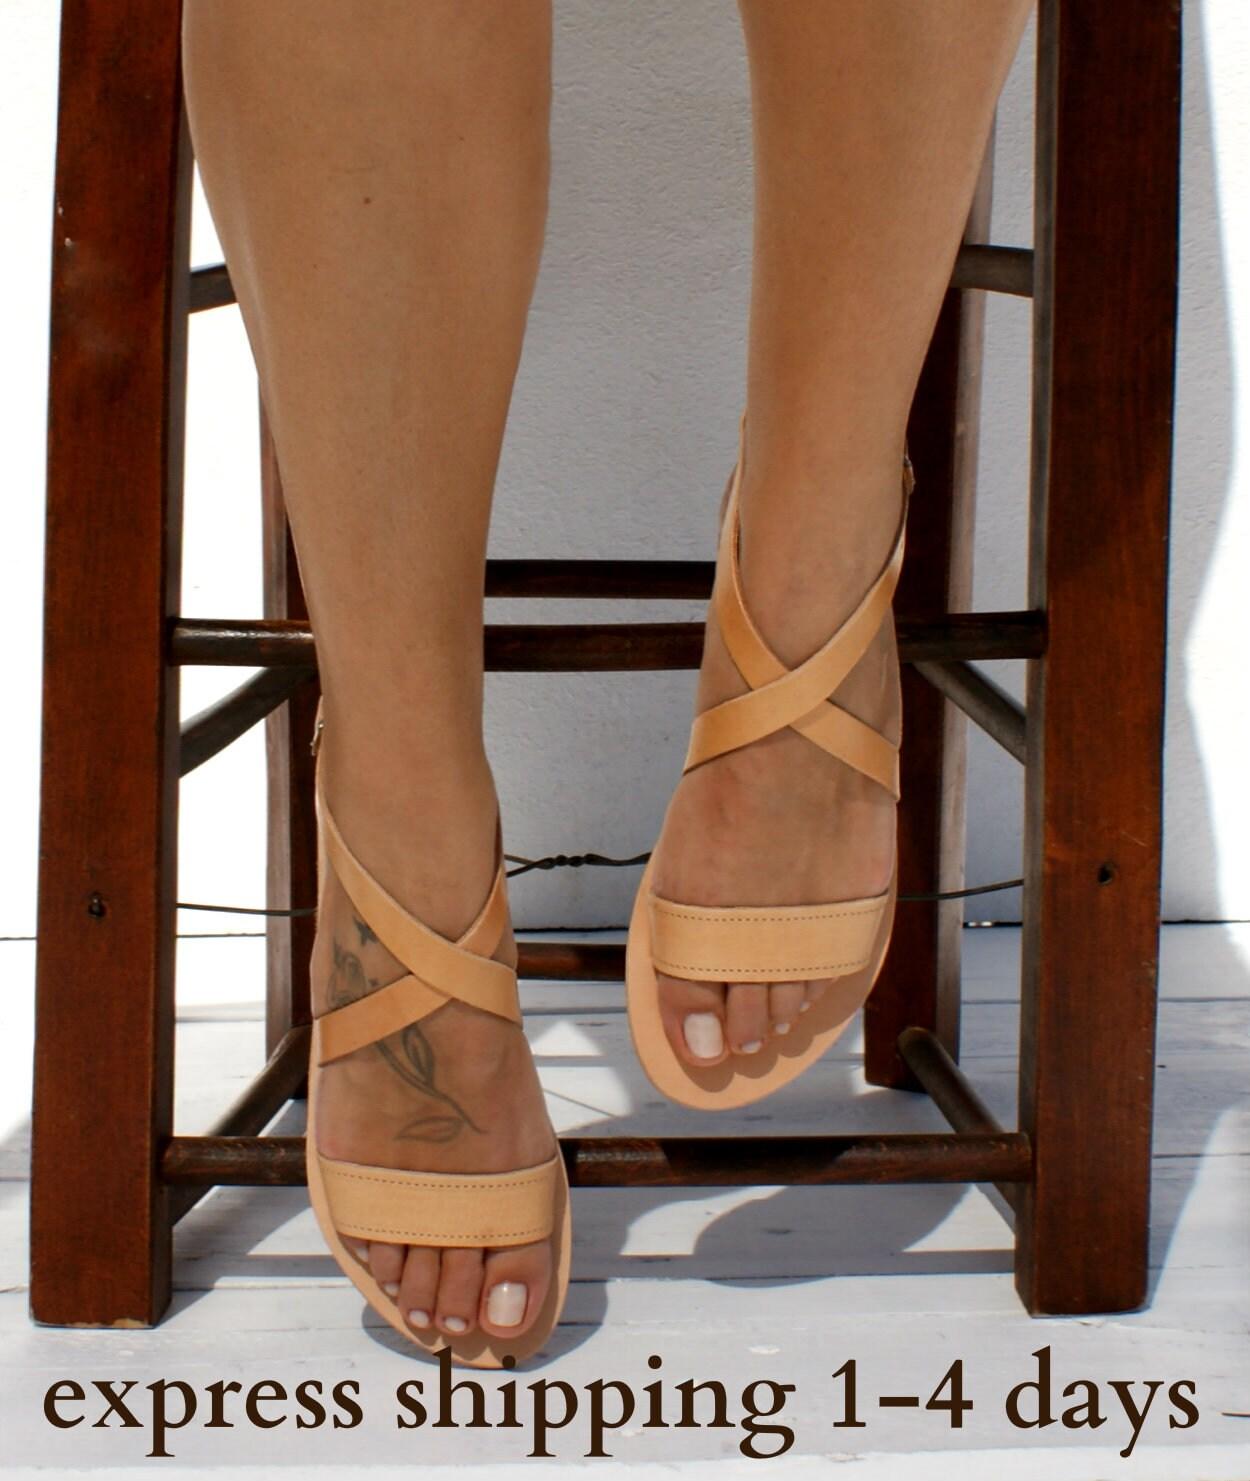 9db83e4ddd06 THETIS sandals  ancient Greek leather sandals  classic leather sandals   handmade sandals  natural leather sandal  criss cross strap sandals